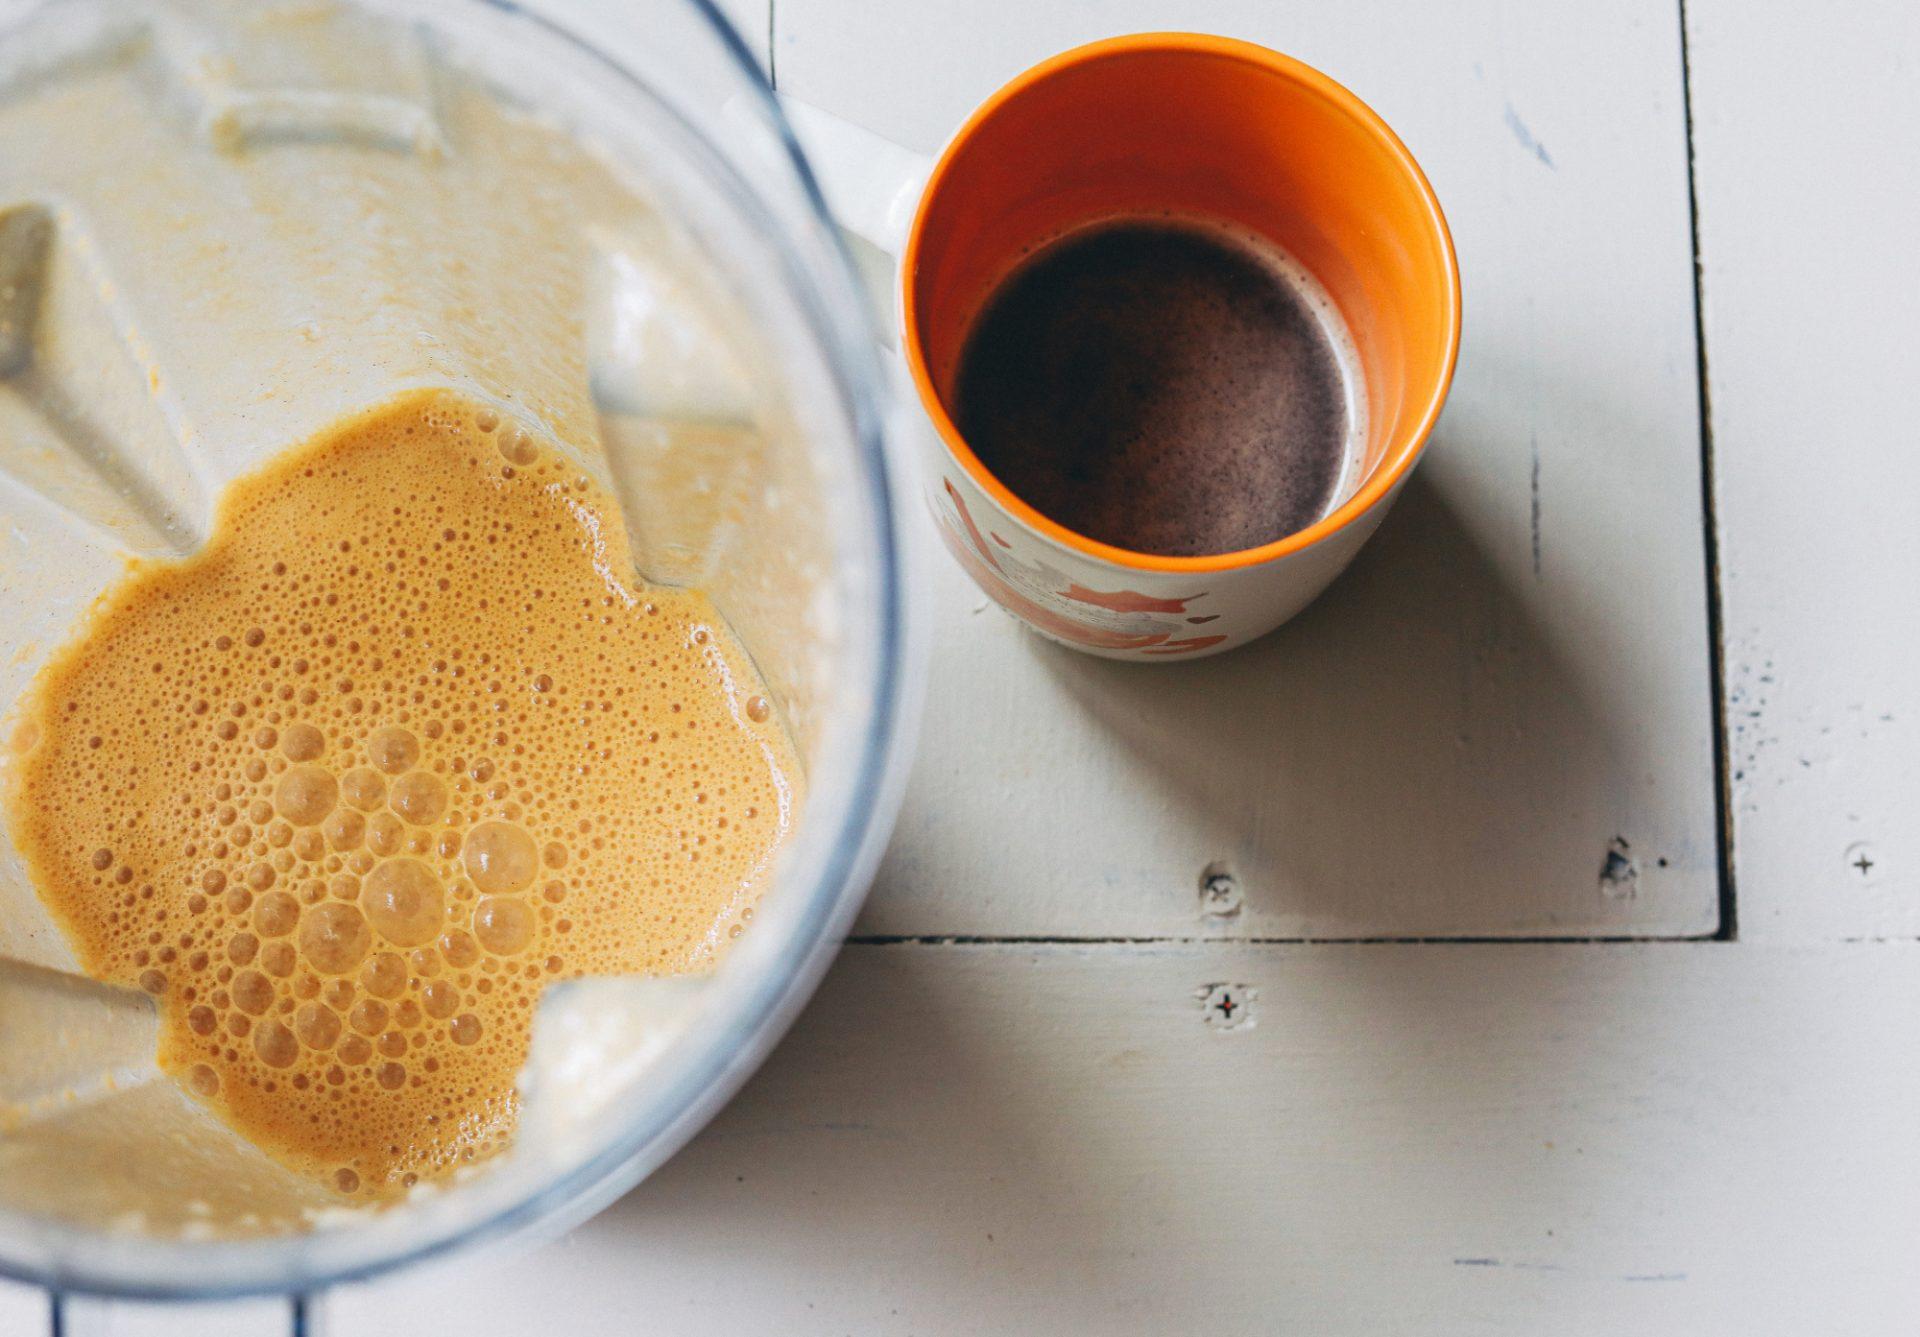 healthy Starbucks drink, pumpkin spiced latte, pumpkin, pumpkin spiced latte, no added sugar, dairy free, vegan, gluten free, healthy, whole20, paleo, fall, autumn, coffee,